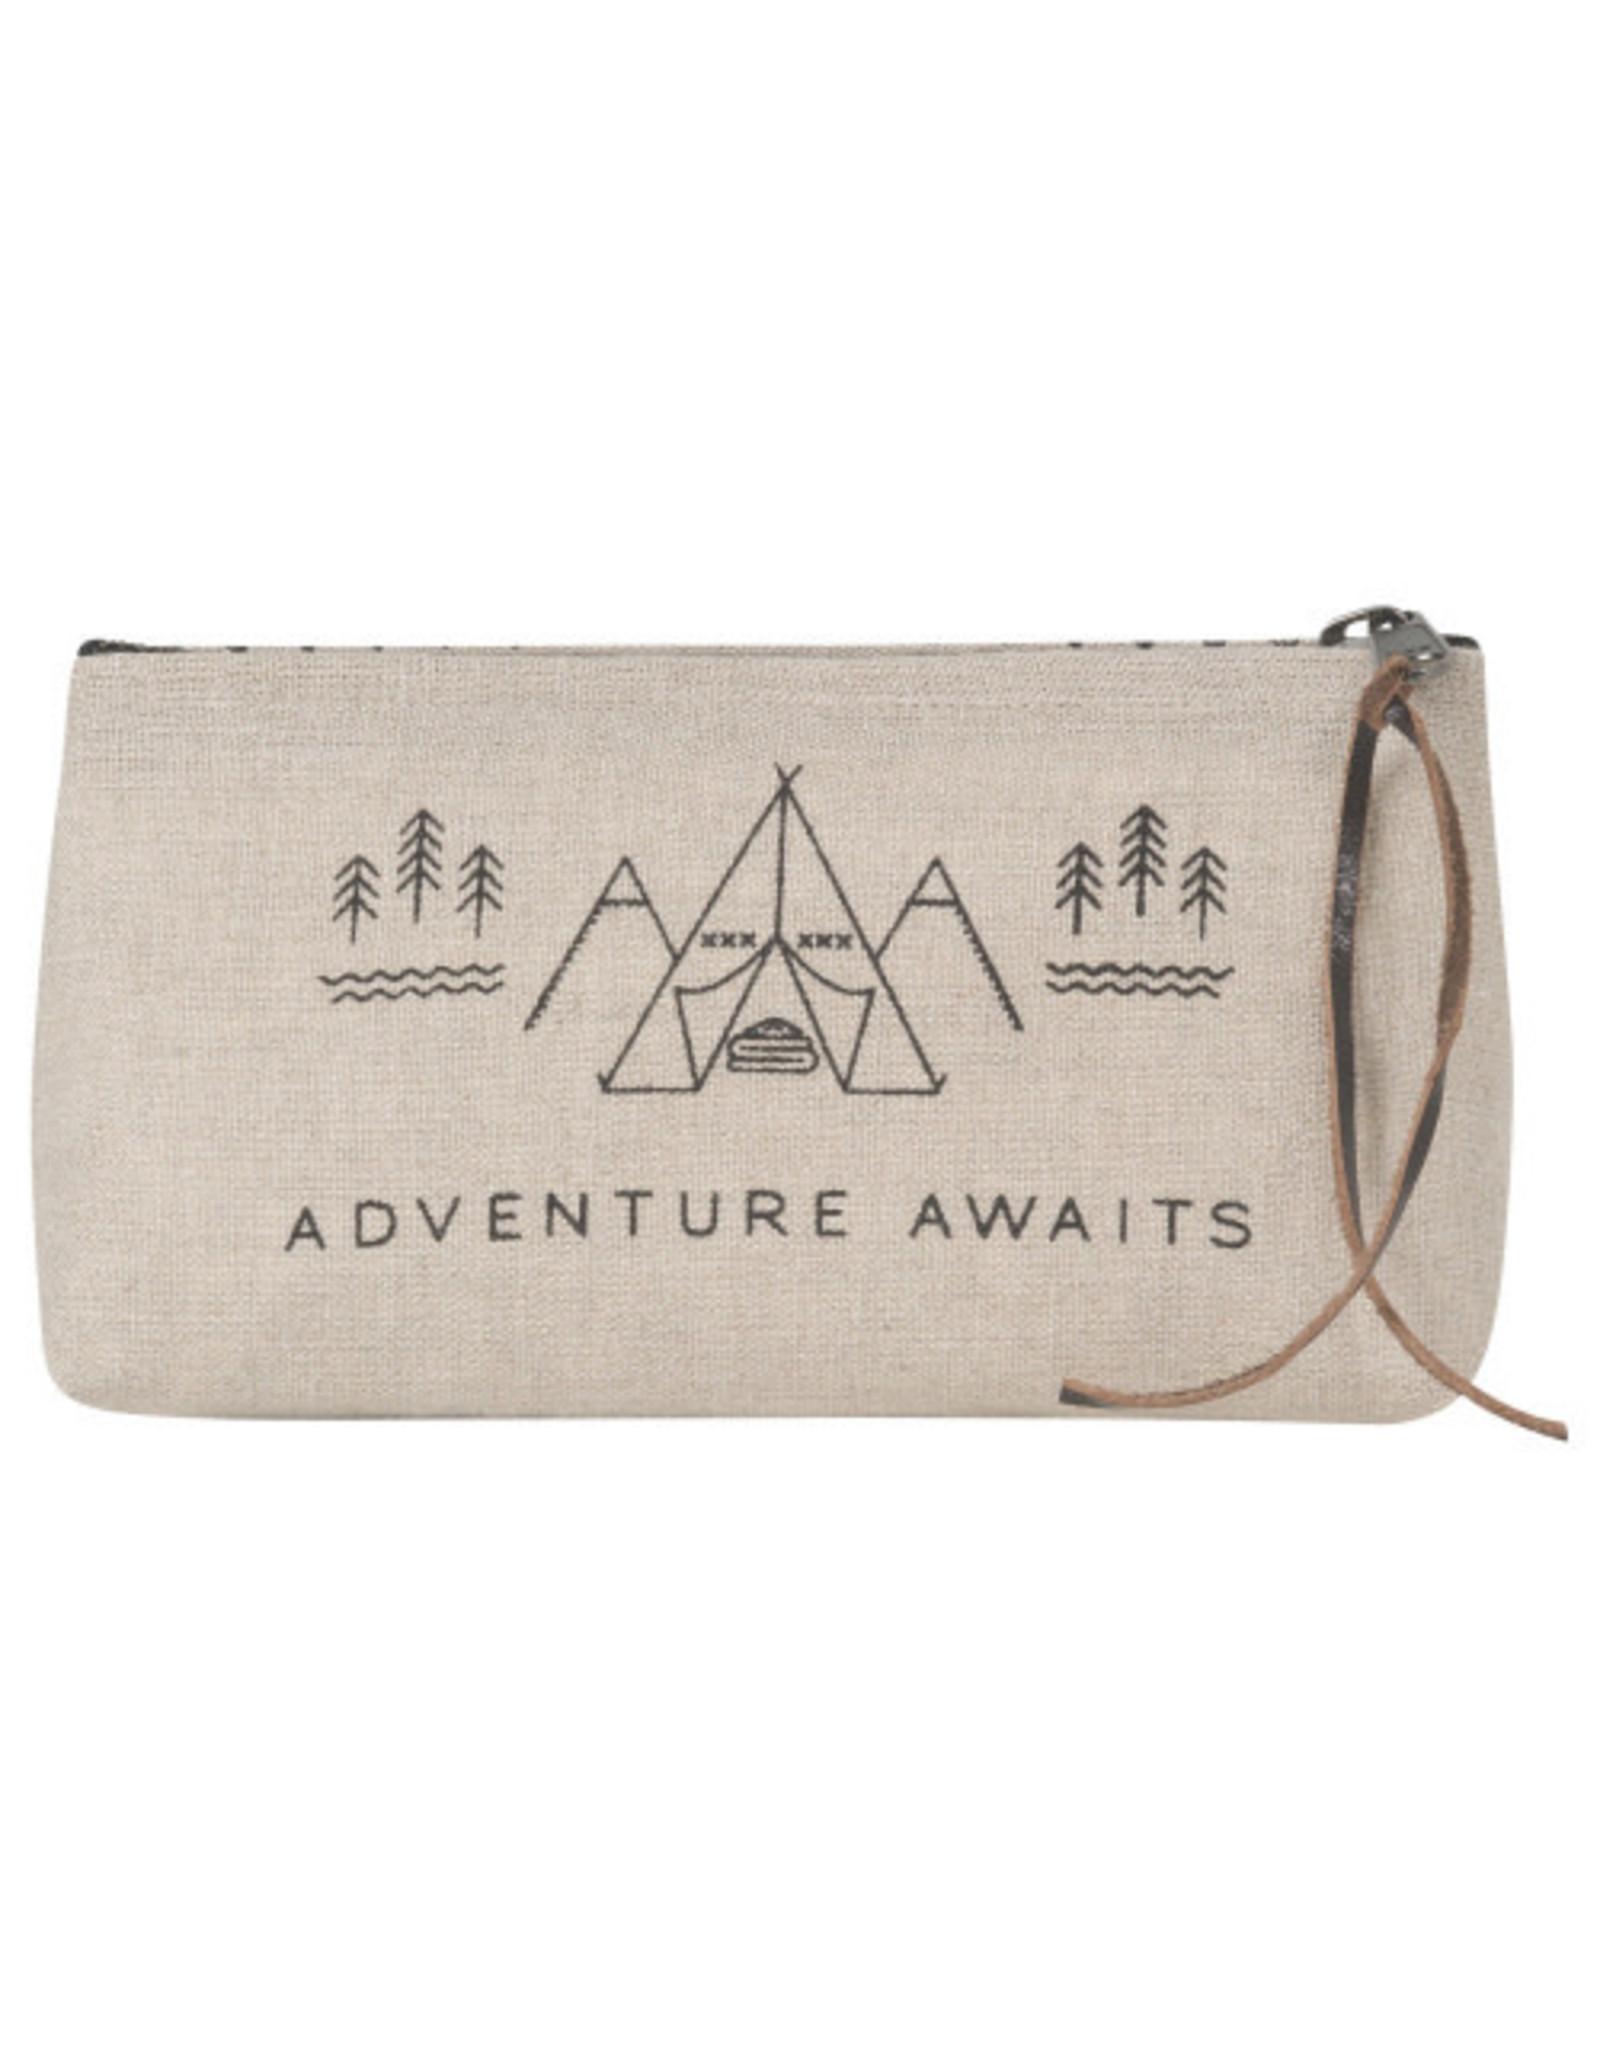 Adventure Awaits Cosmetic Bag Pencil